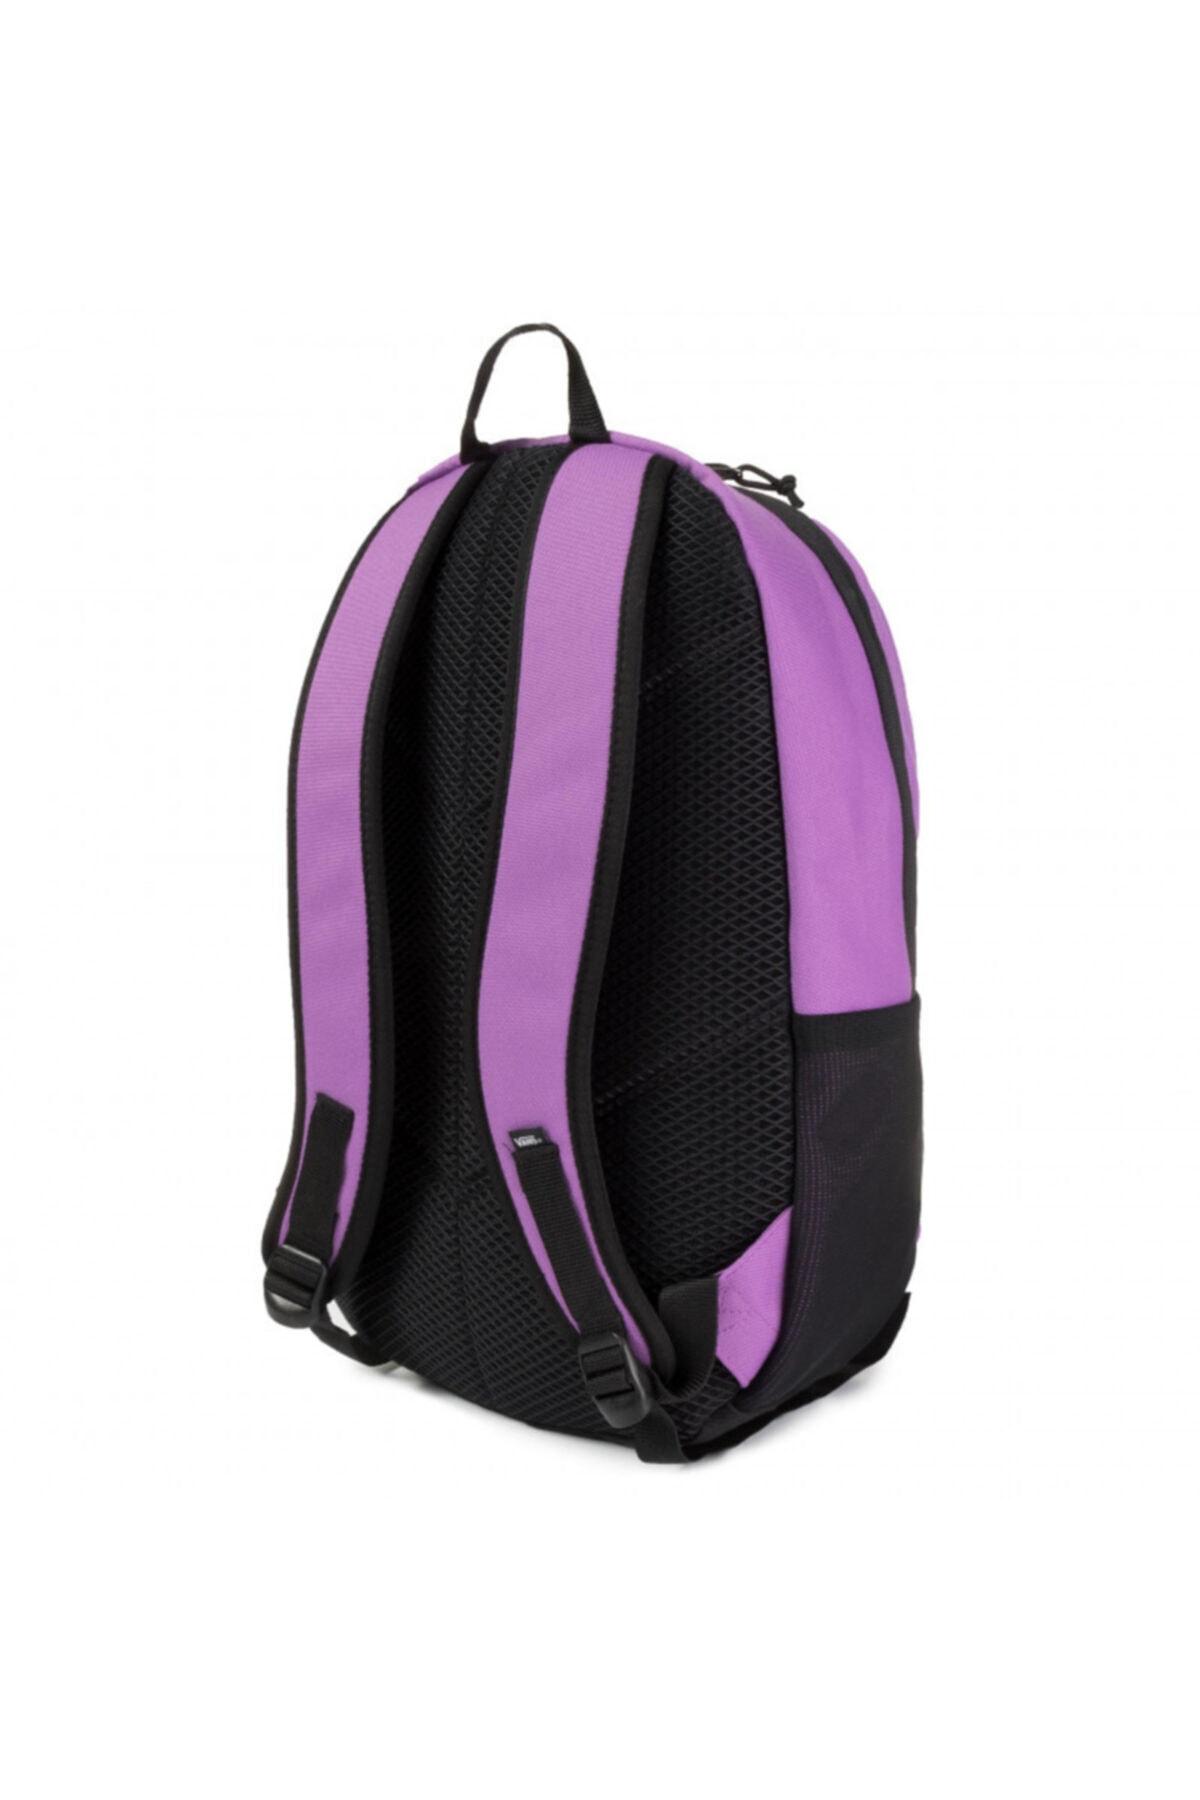 Vans Disorder Backpack Erkek Mor Sırt Çantası Vn0a3ı68zua1 2